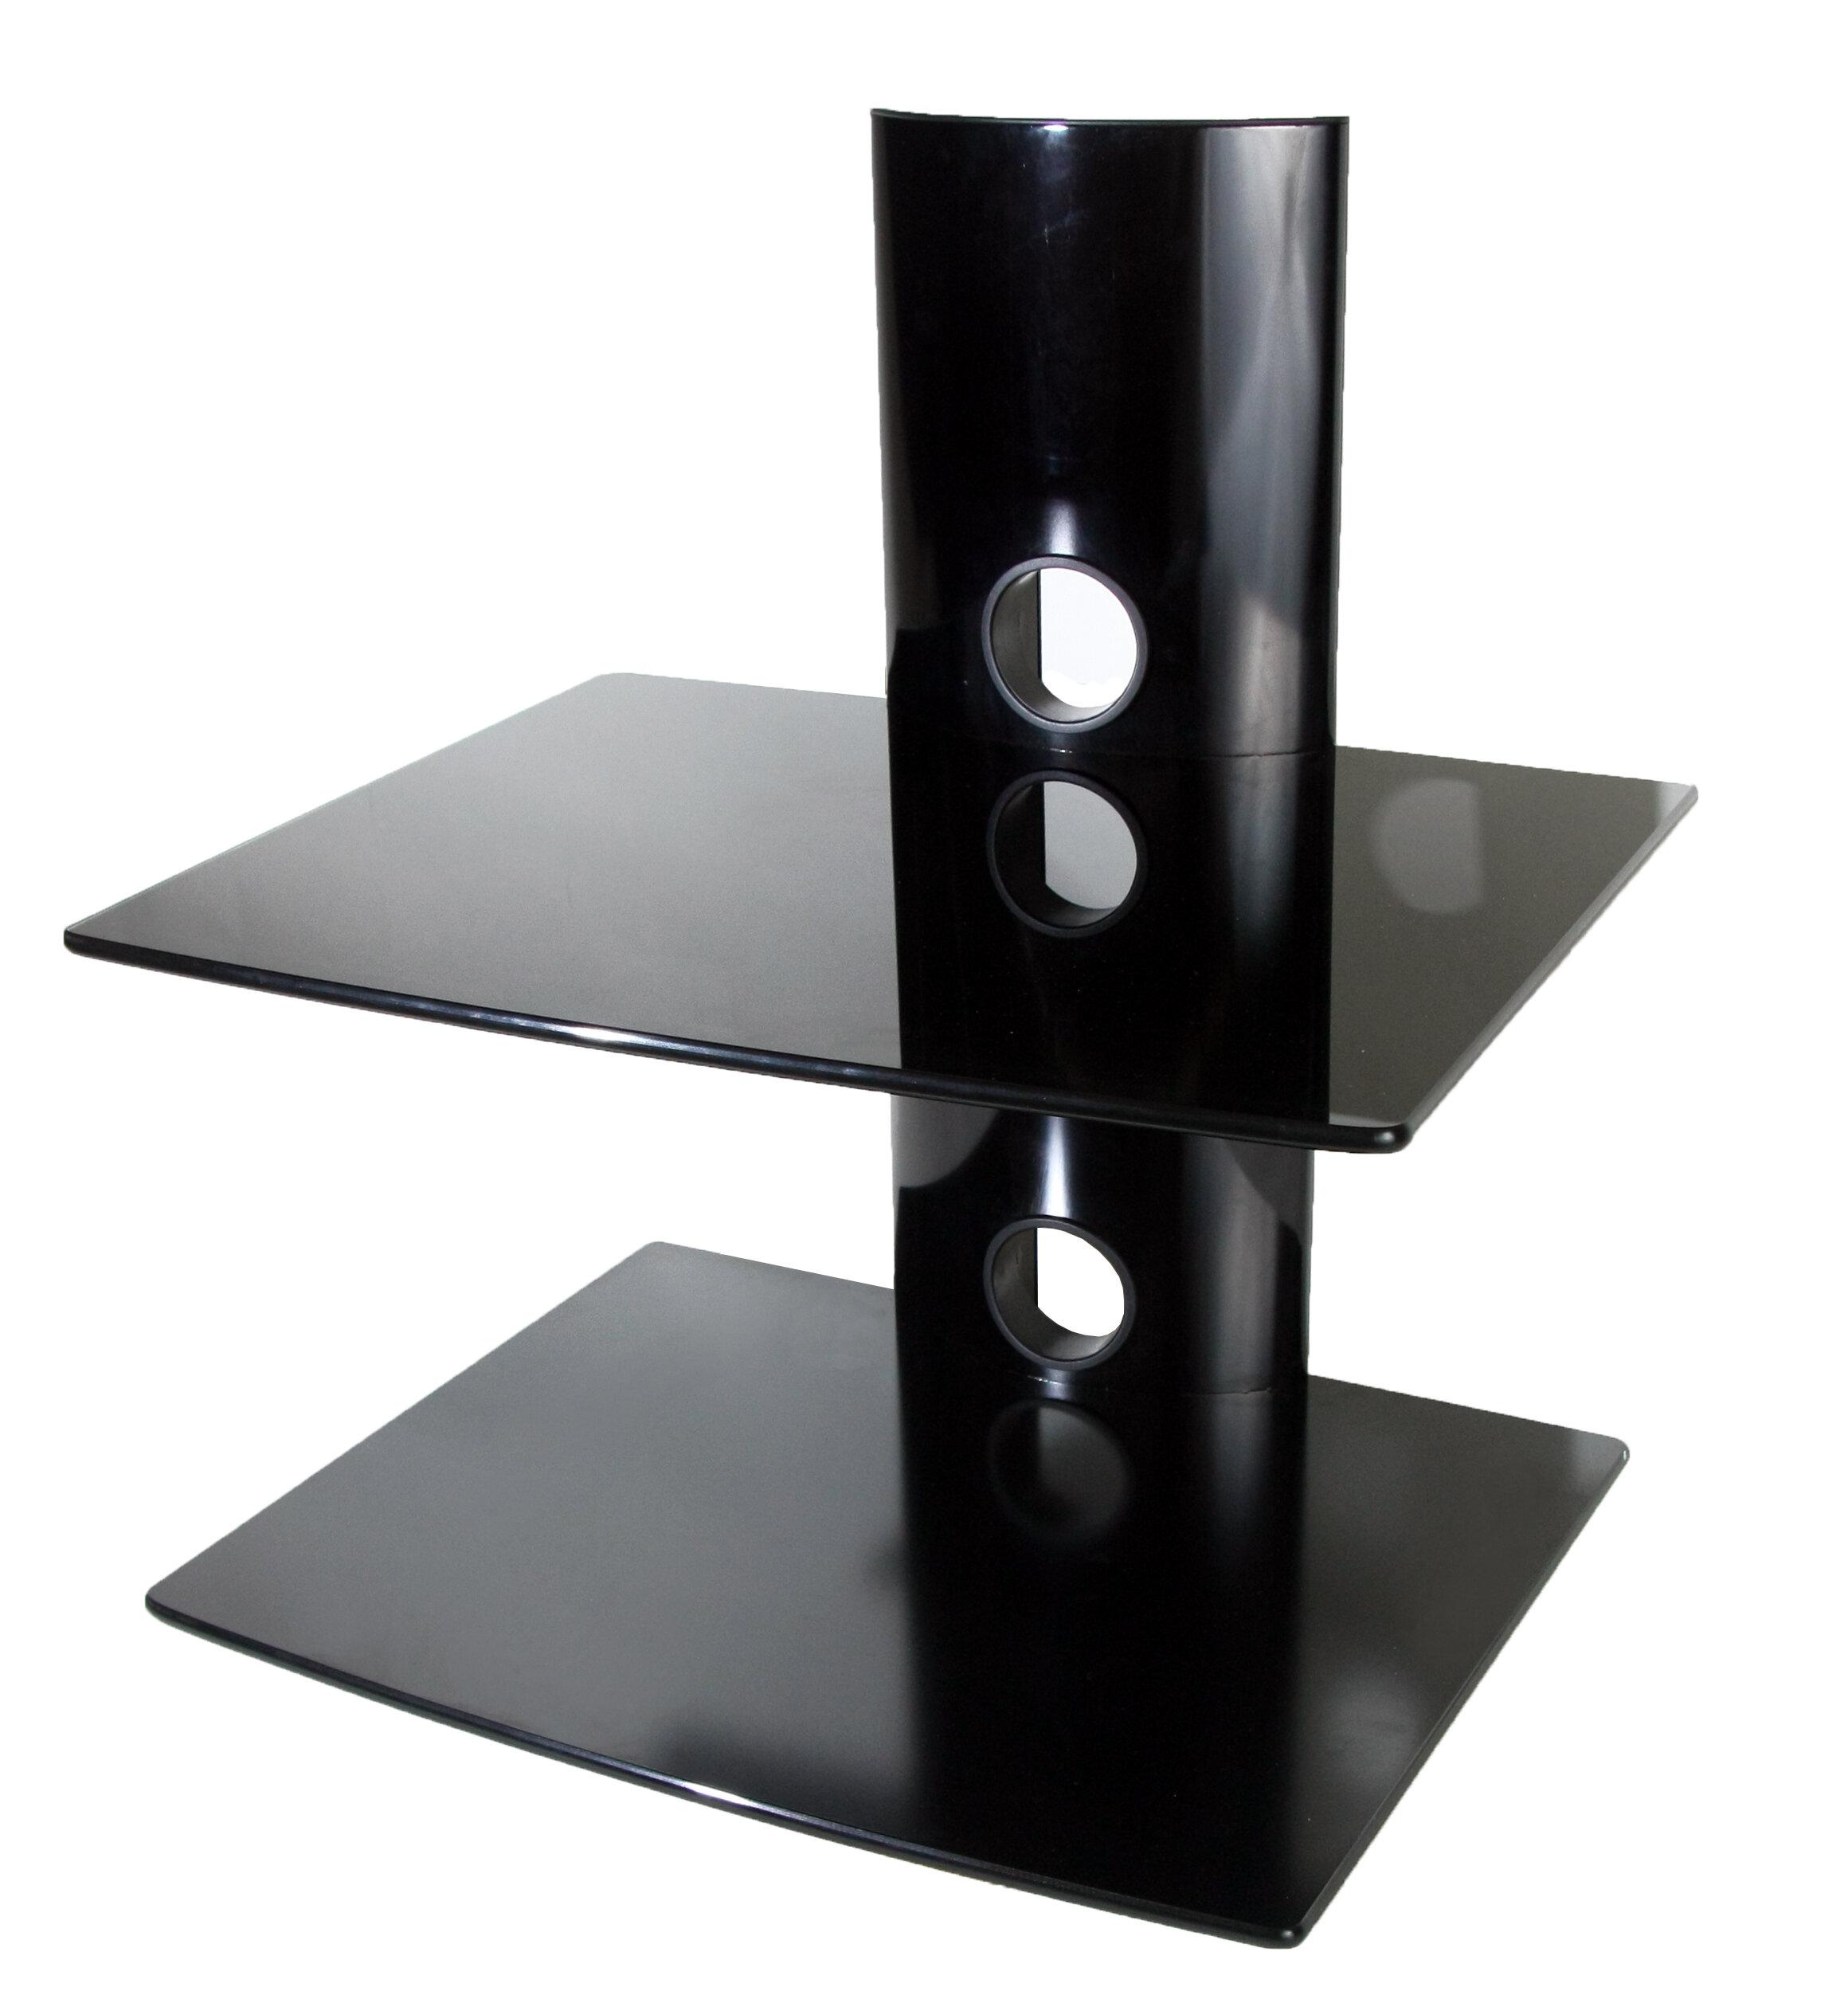 tv mount consoles dvd sky glass game b shelf x for comxuk wall product